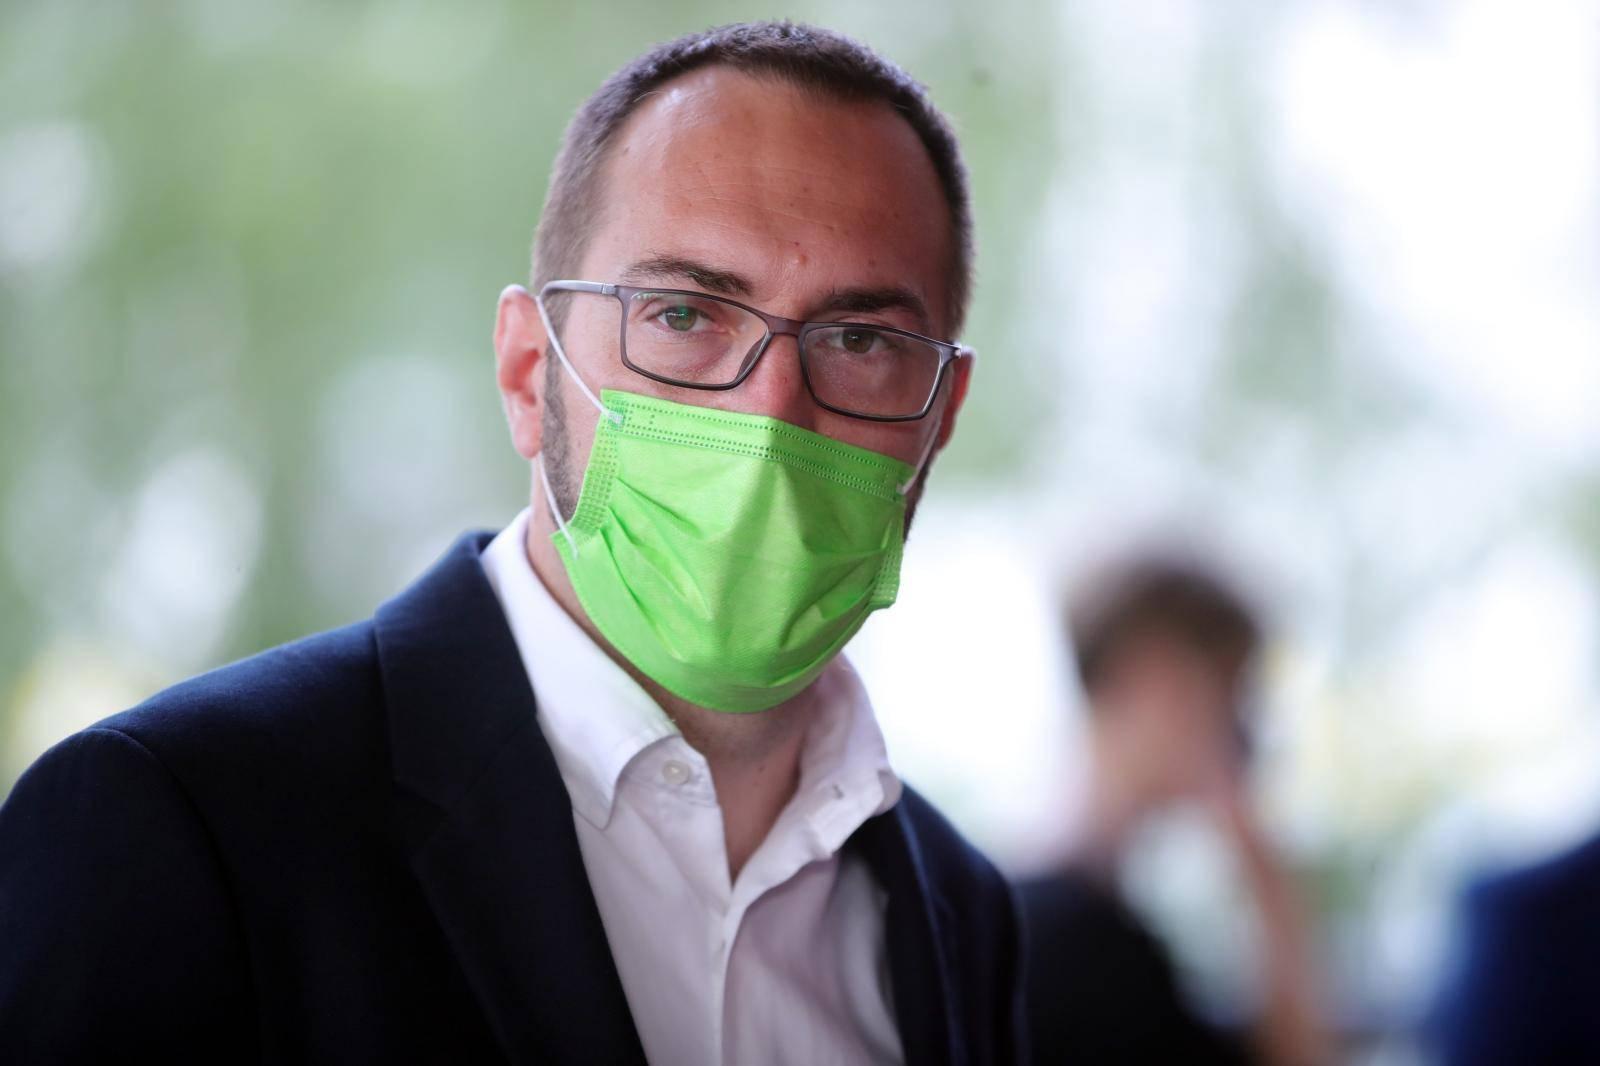 Izborni stožer kandidata za gradonačelnika Zagreba Tomislava Tomasevica